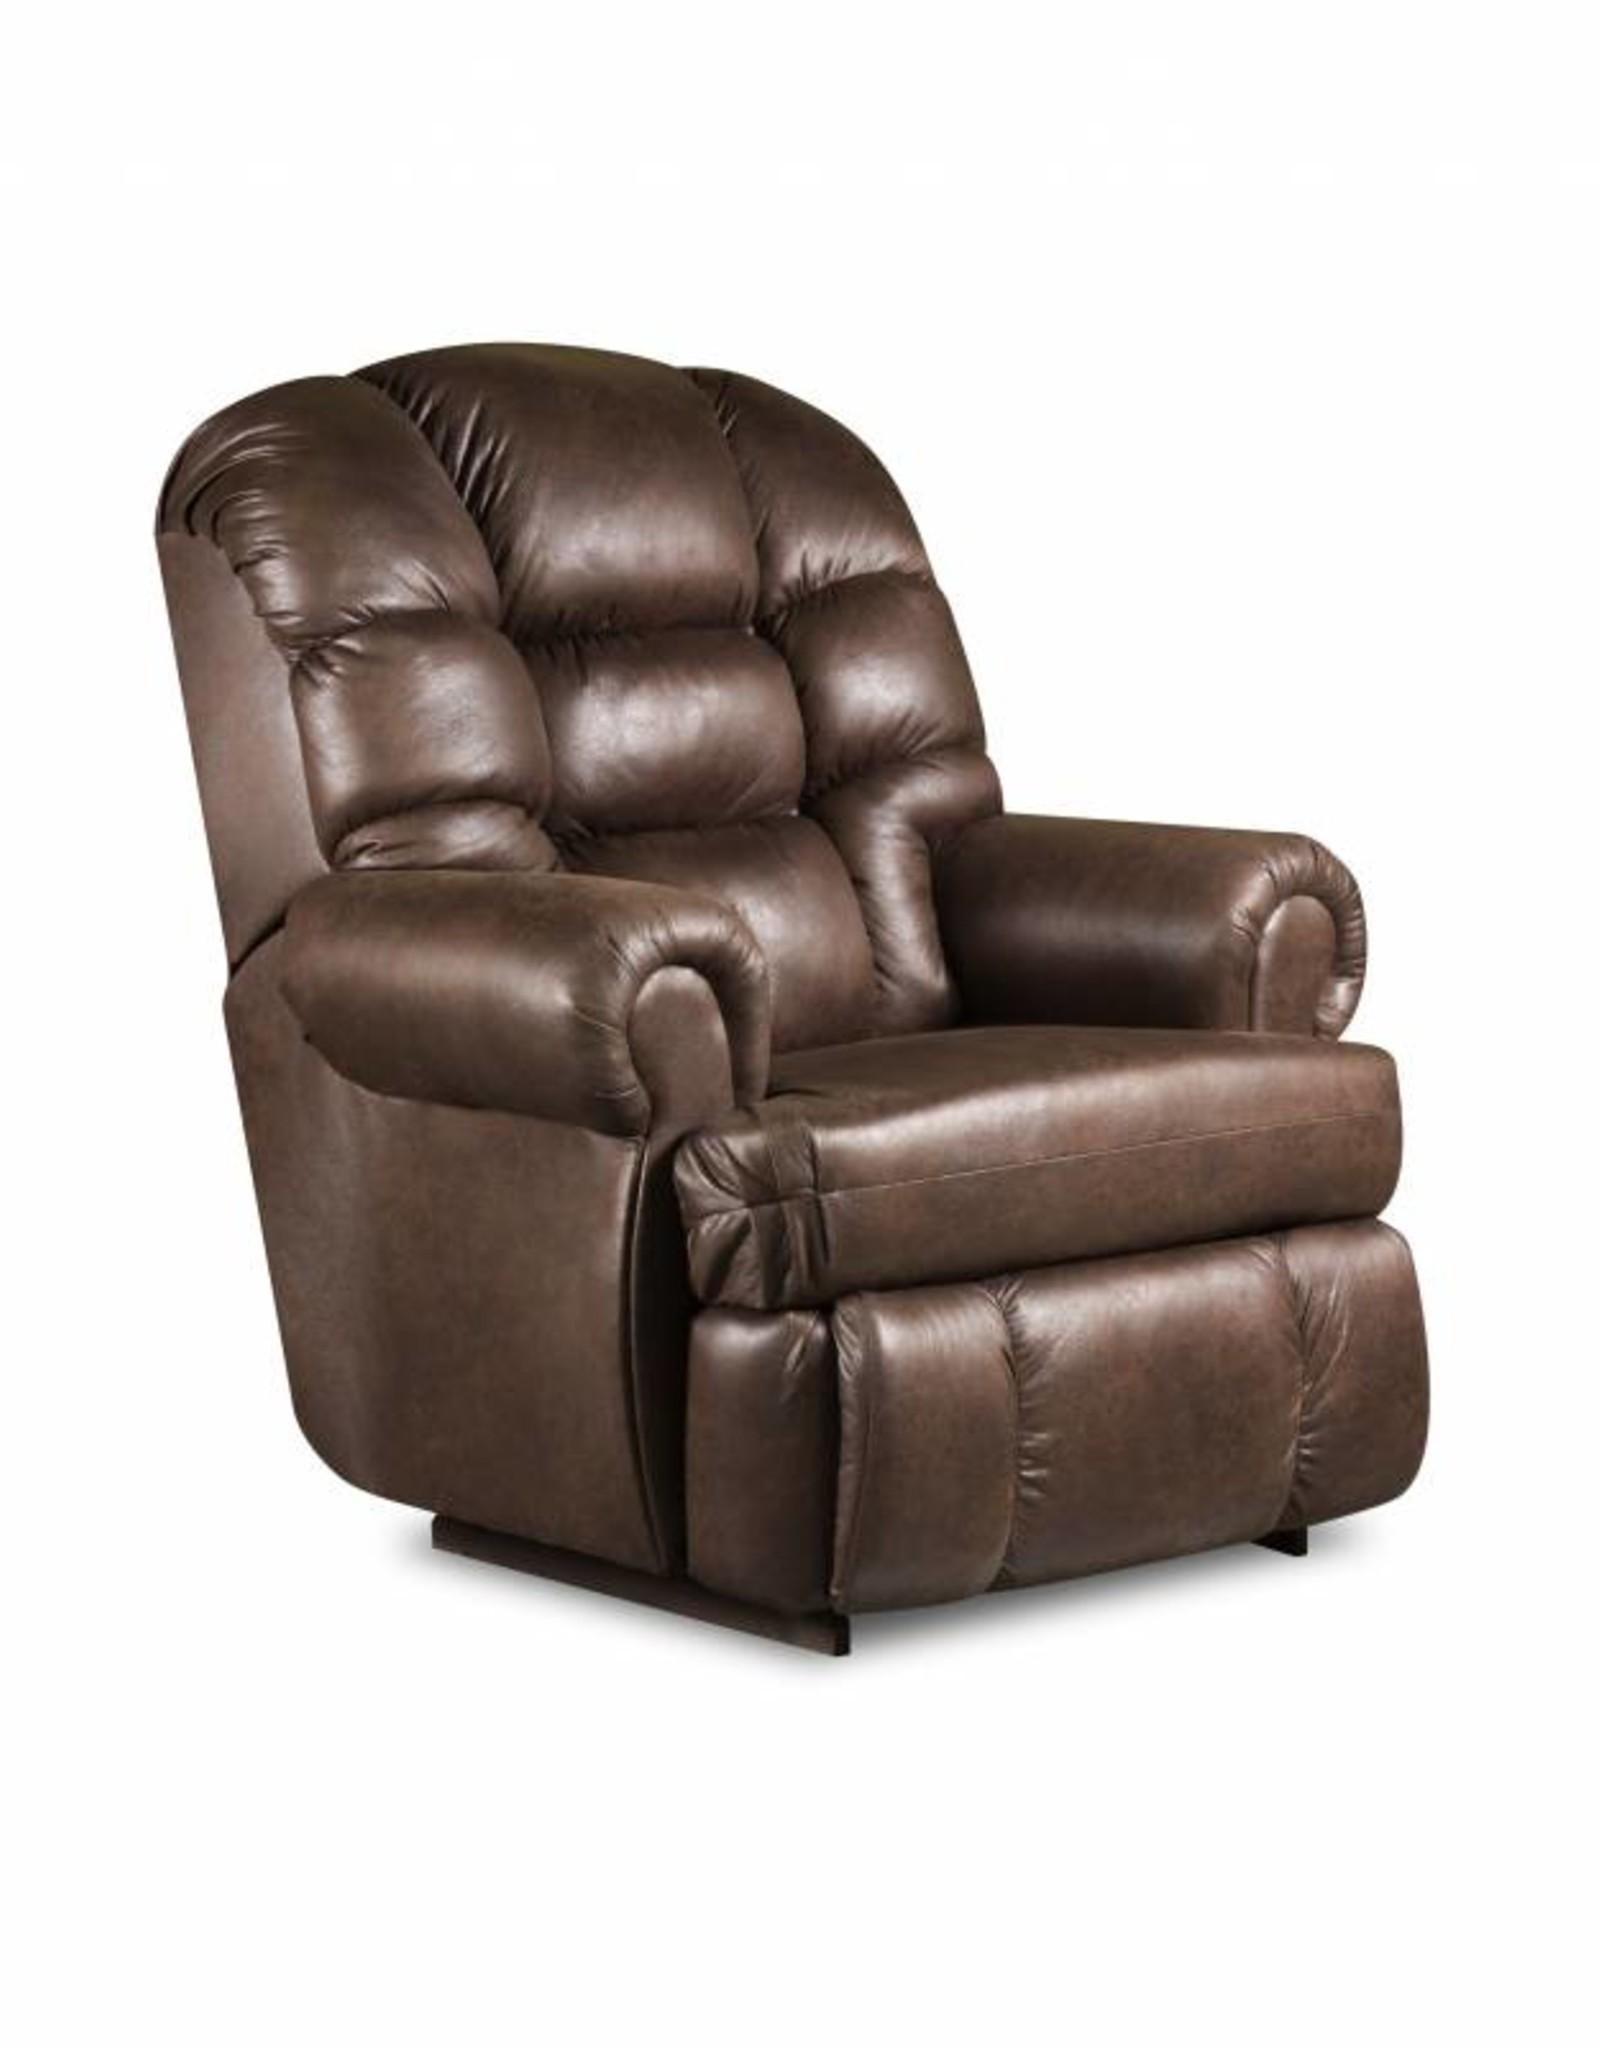 American Furniture Stallion Recliner 1/2